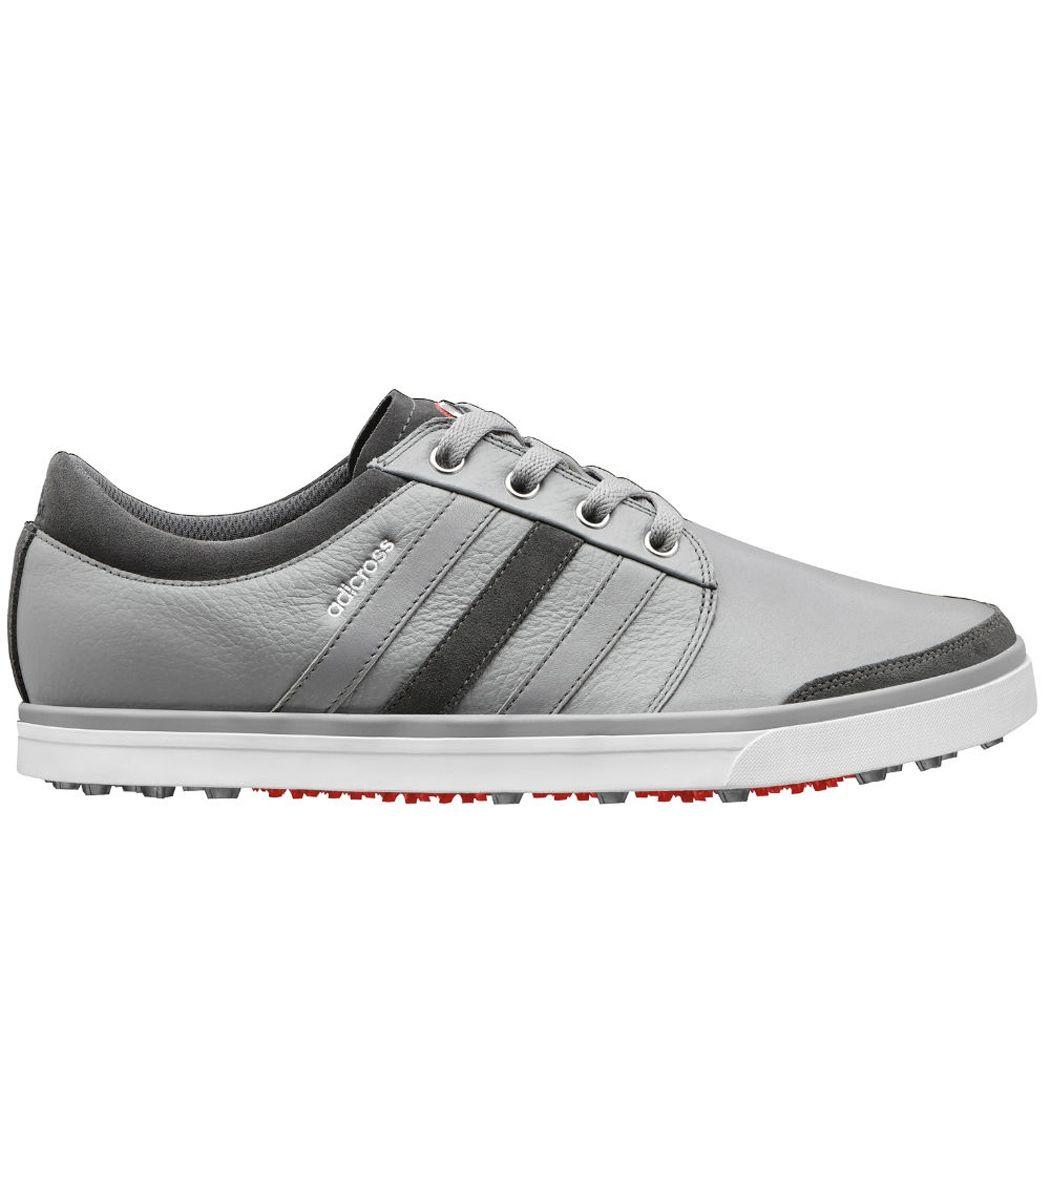 Buy Adidas adiCross Gripmore Golf Shoes Aluminum/White | Golf Discount